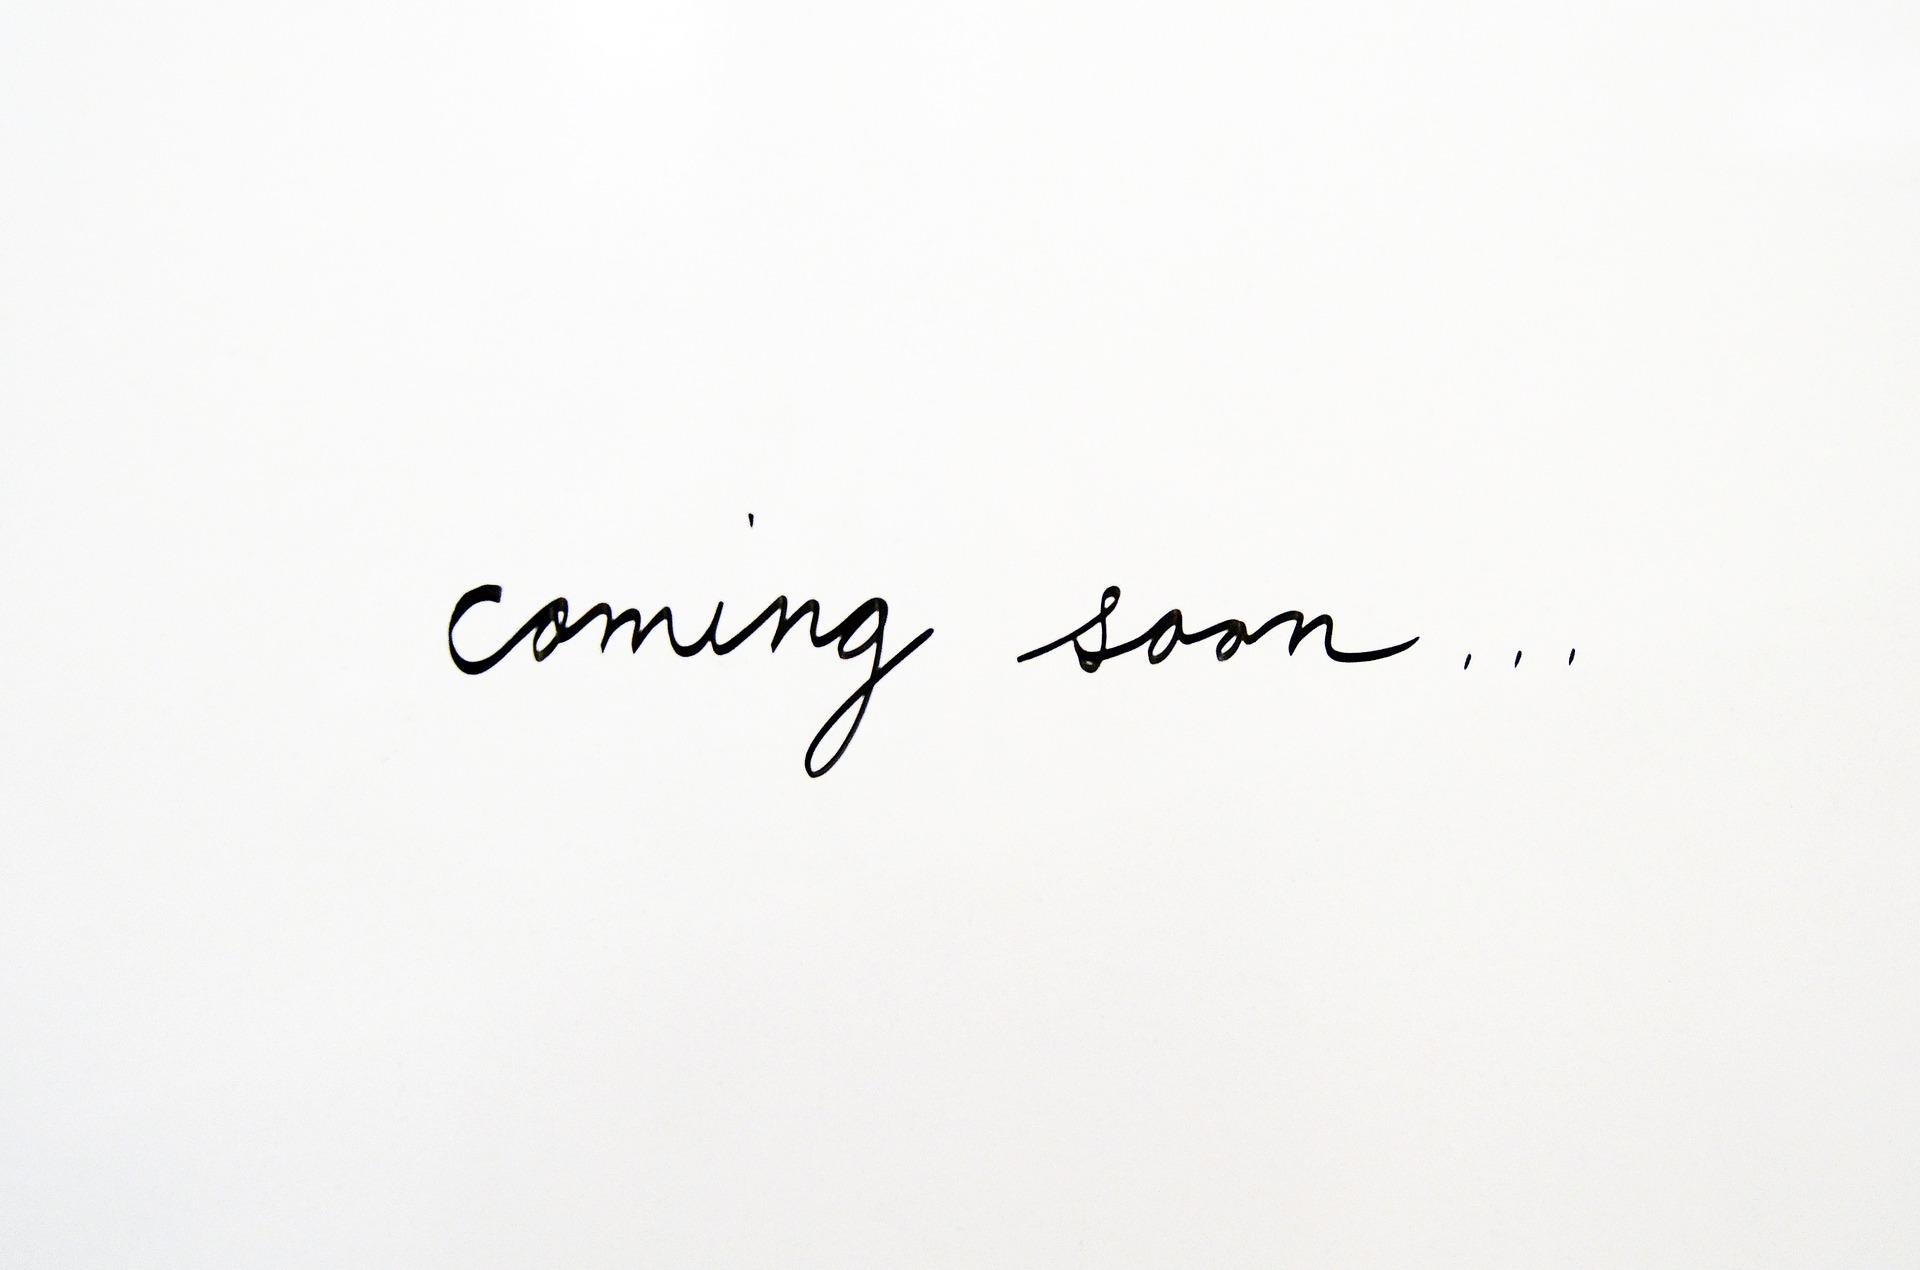 coming-soon-2579129_1920